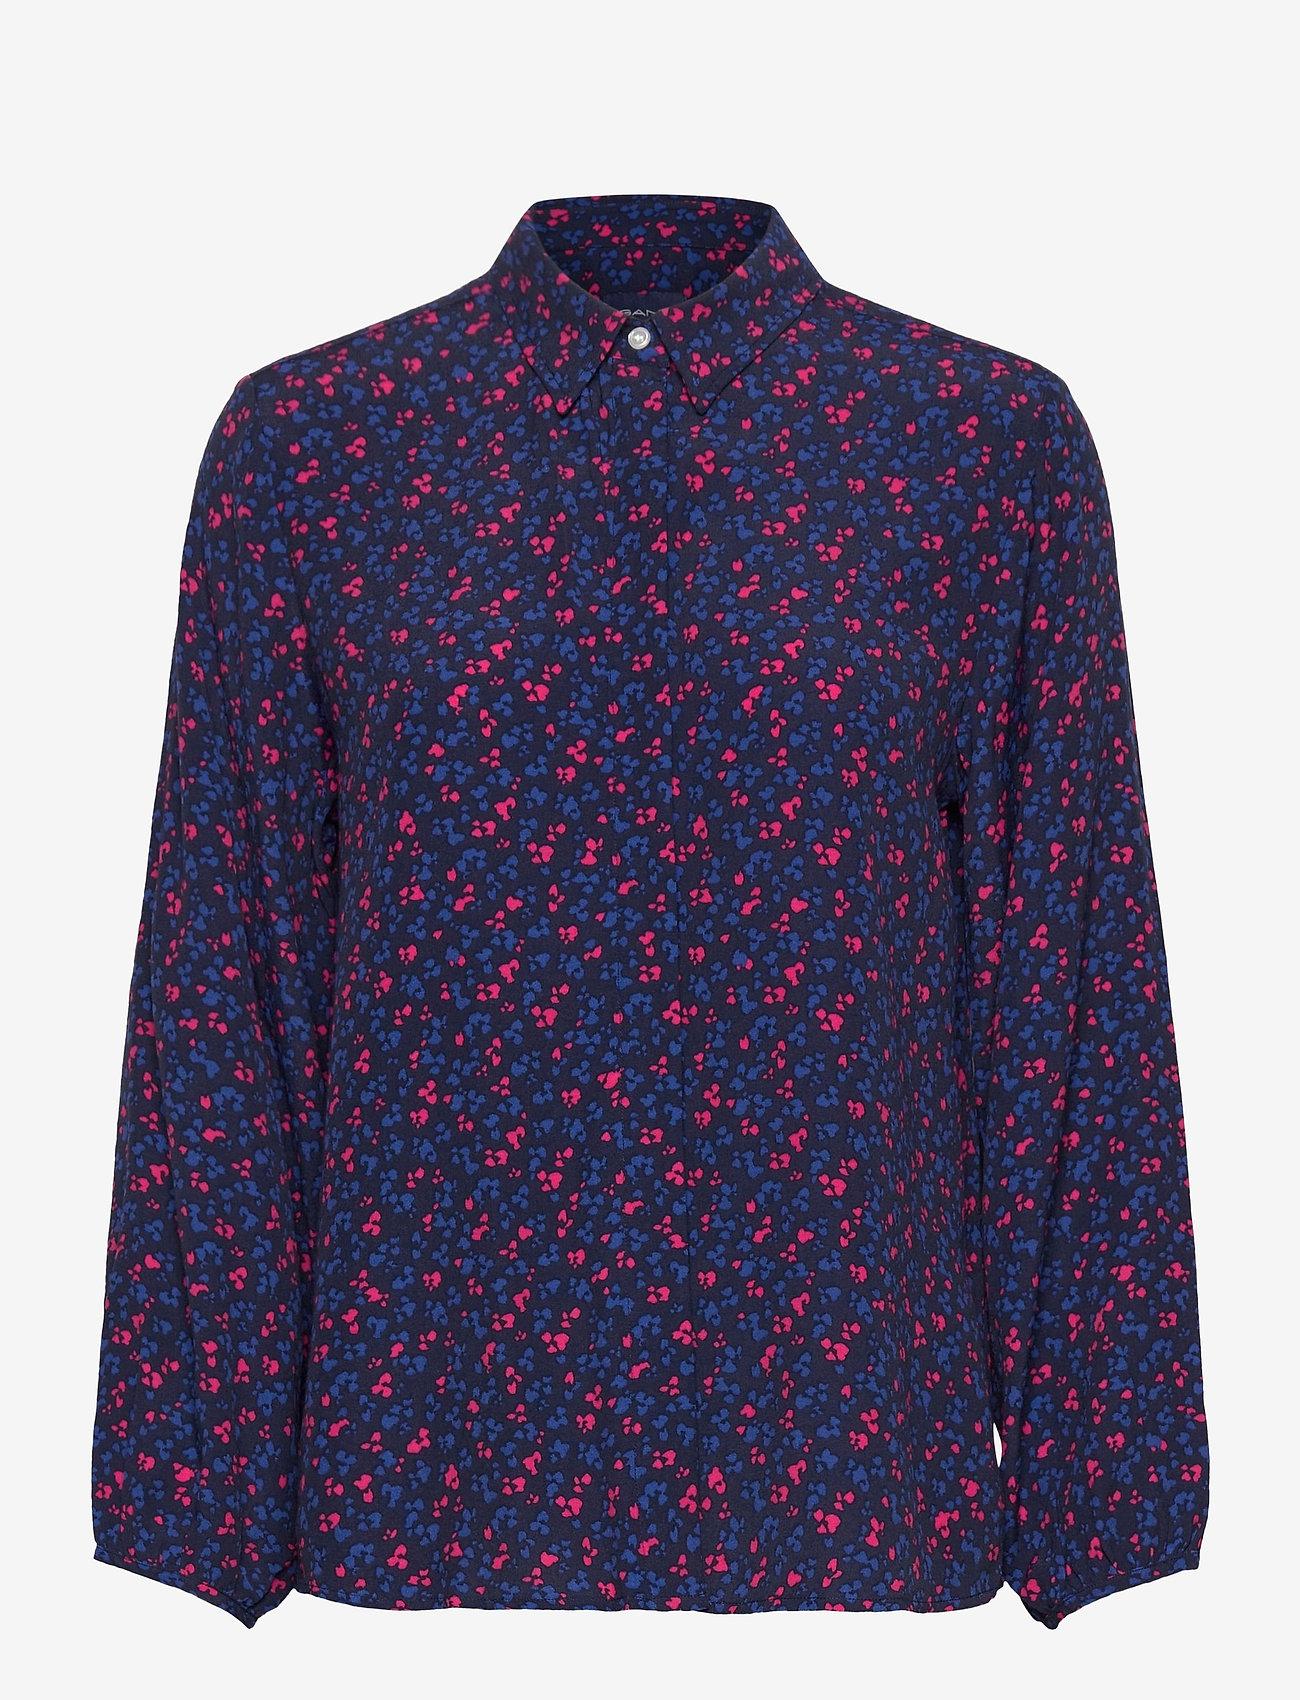 GANT - D1. CLOVER GARDEN VISCOSE BLOUSE - long sleeved blouses - evening blue - 0